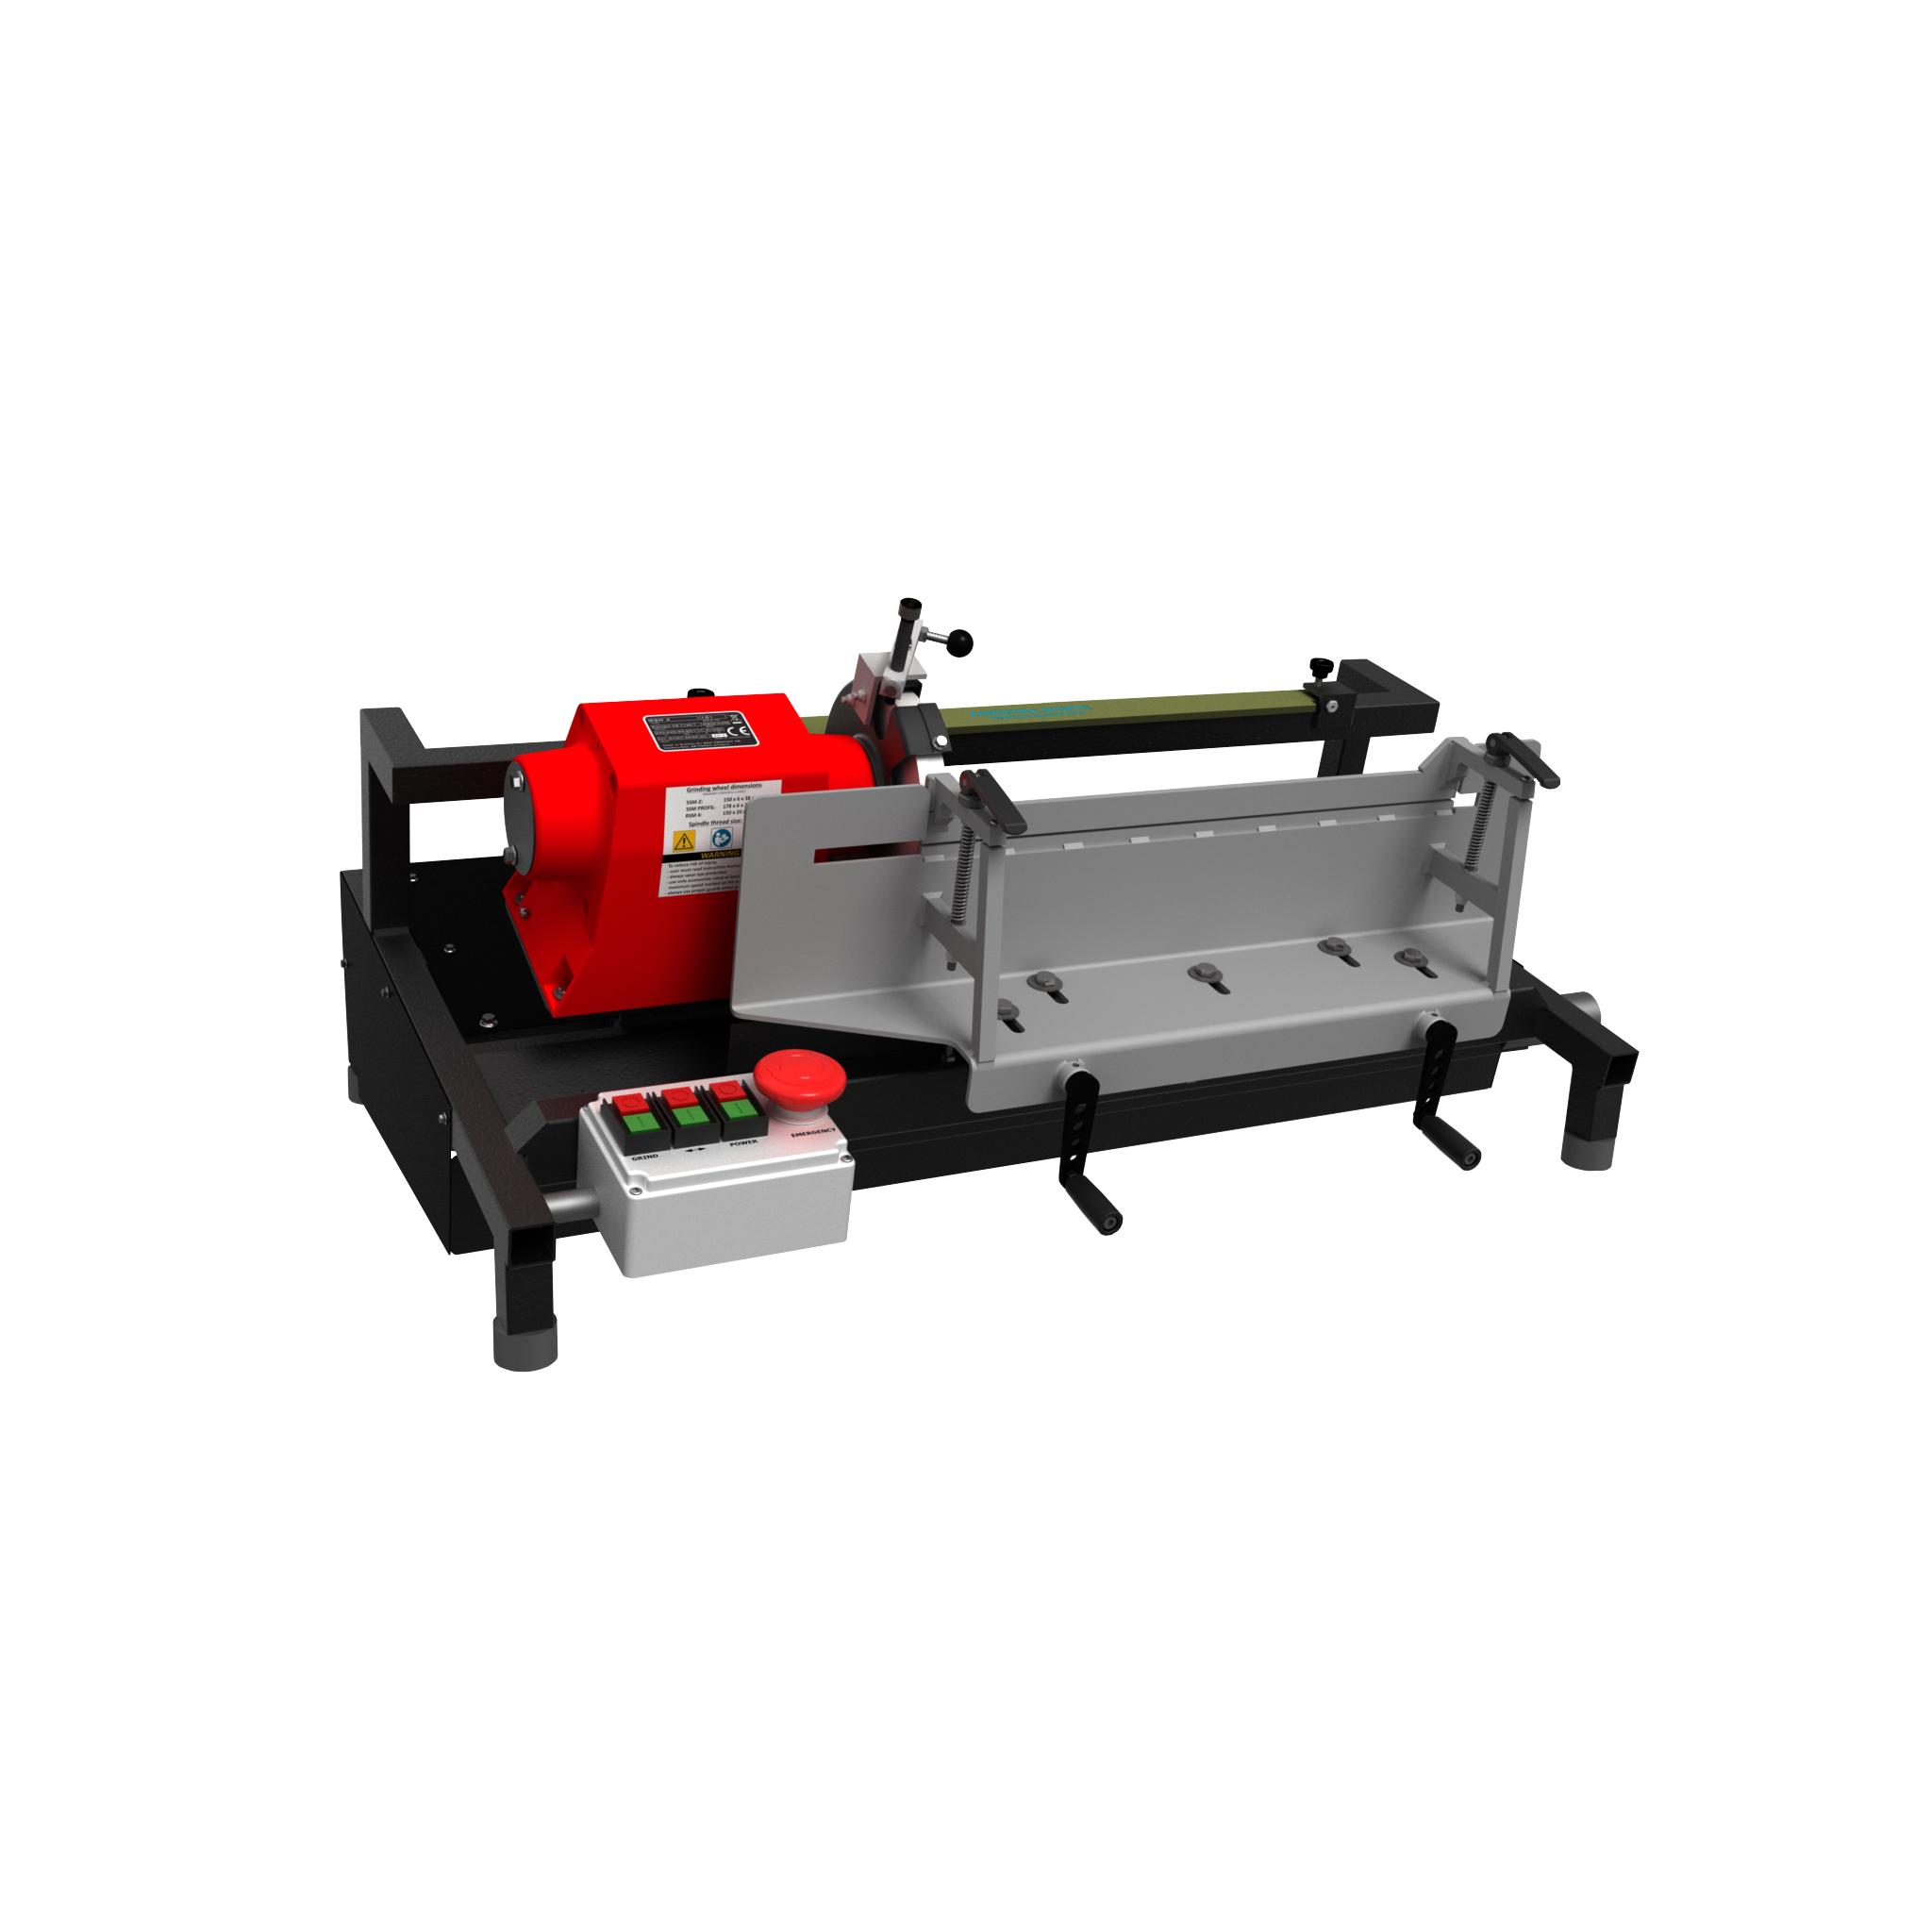 RSM 4 contour sharpener